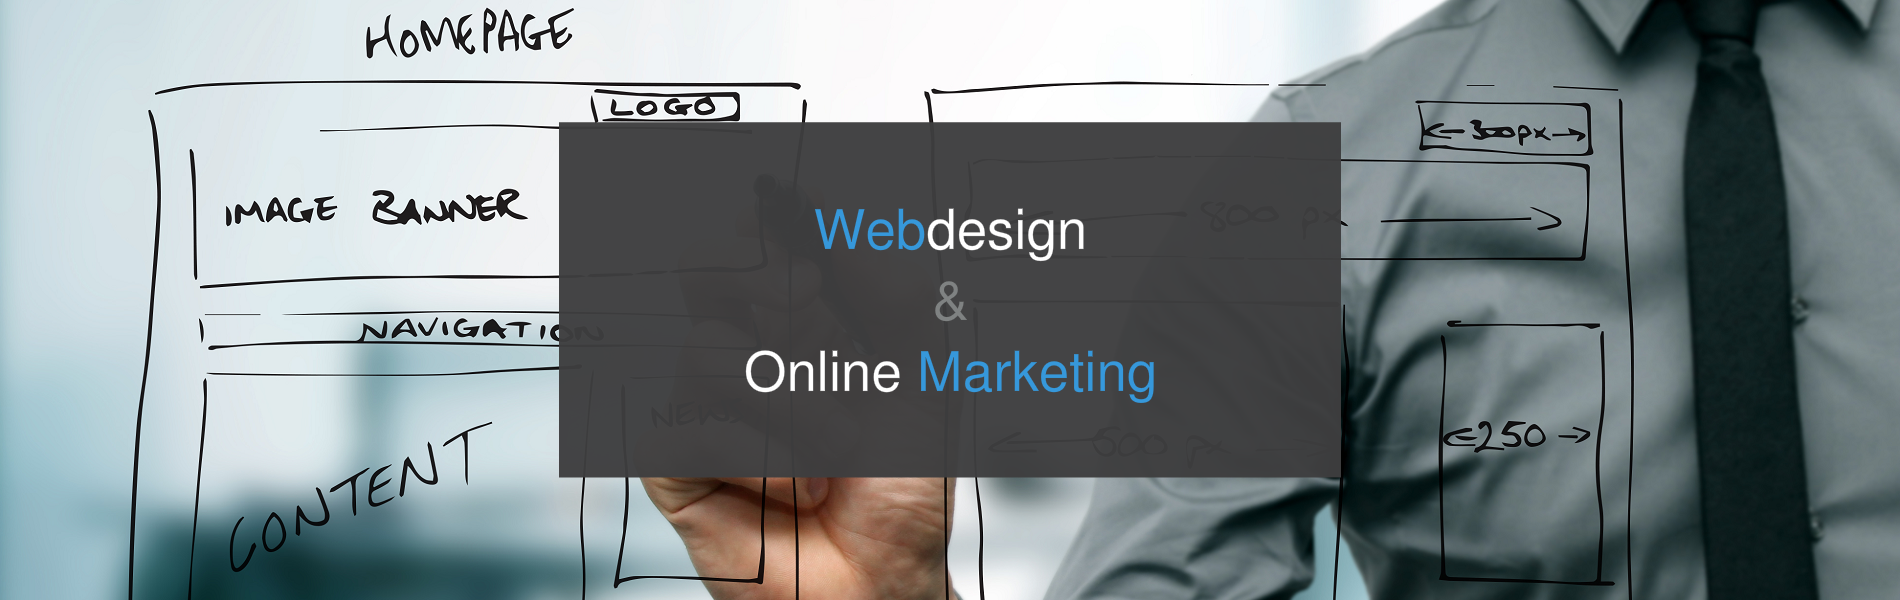 meppen webdesign